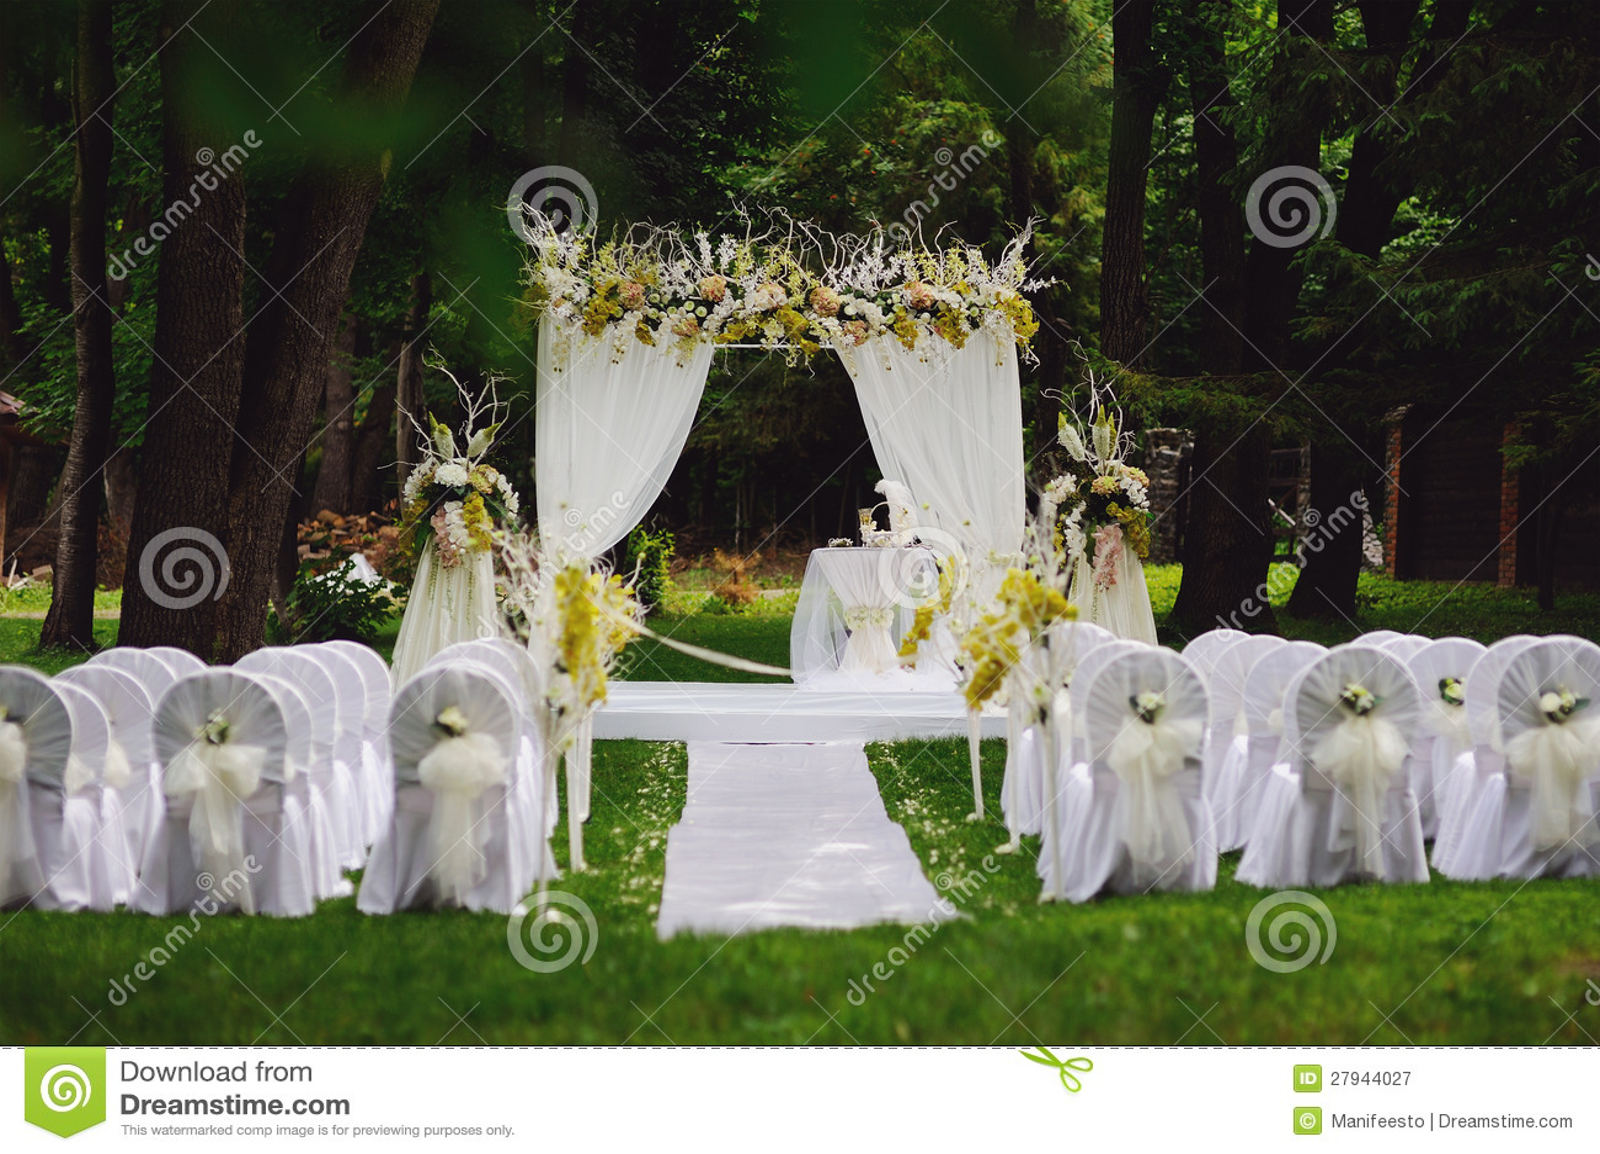 Ceremonia de boda en jard n imagen de archivo imagen for Bodas en jardin